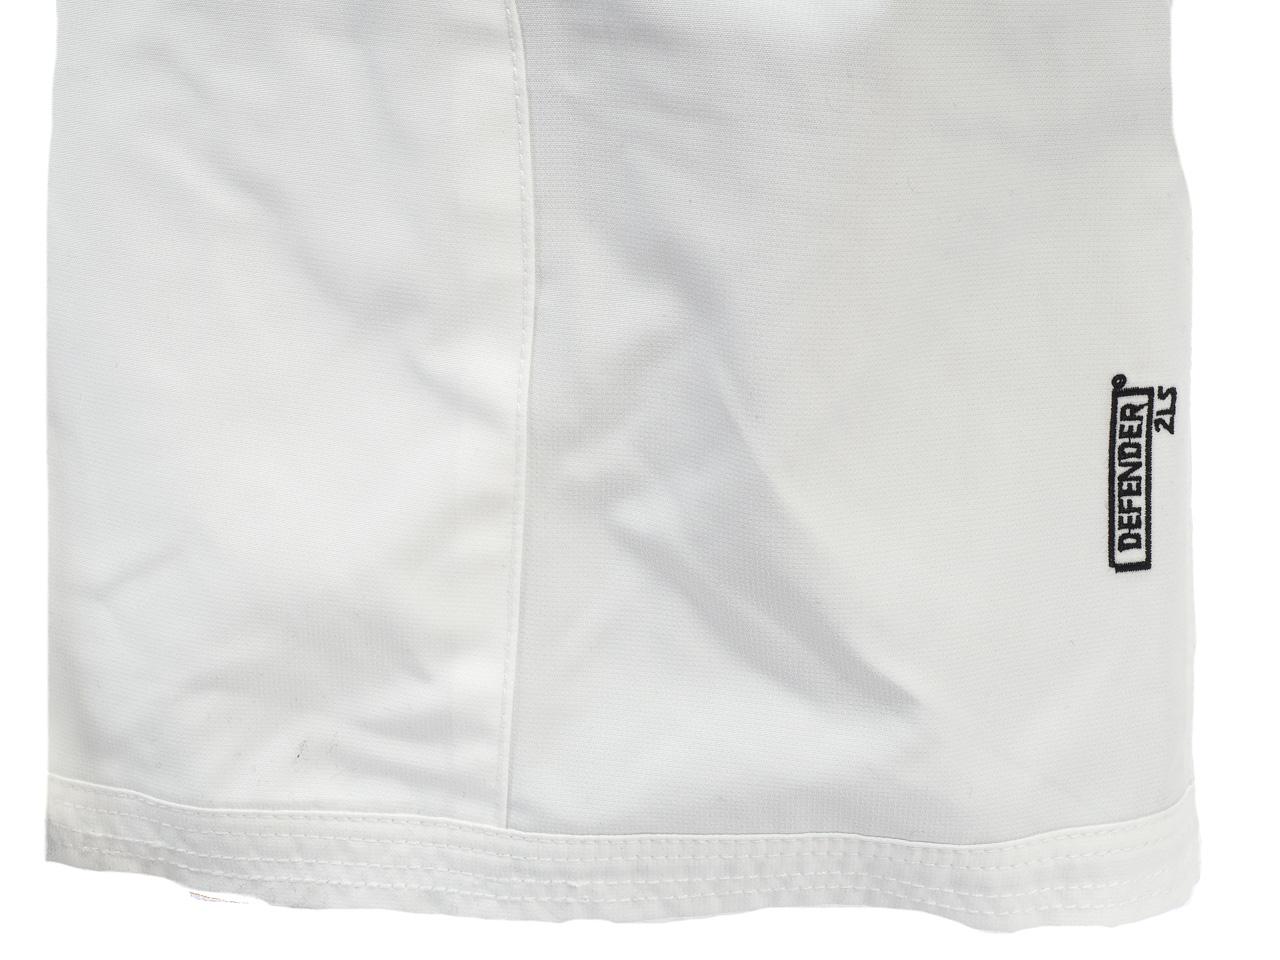 Ski-Pants-Surf-Eider-on-the-Molina-Pant-White-L-White-26880-New thumbnail 4